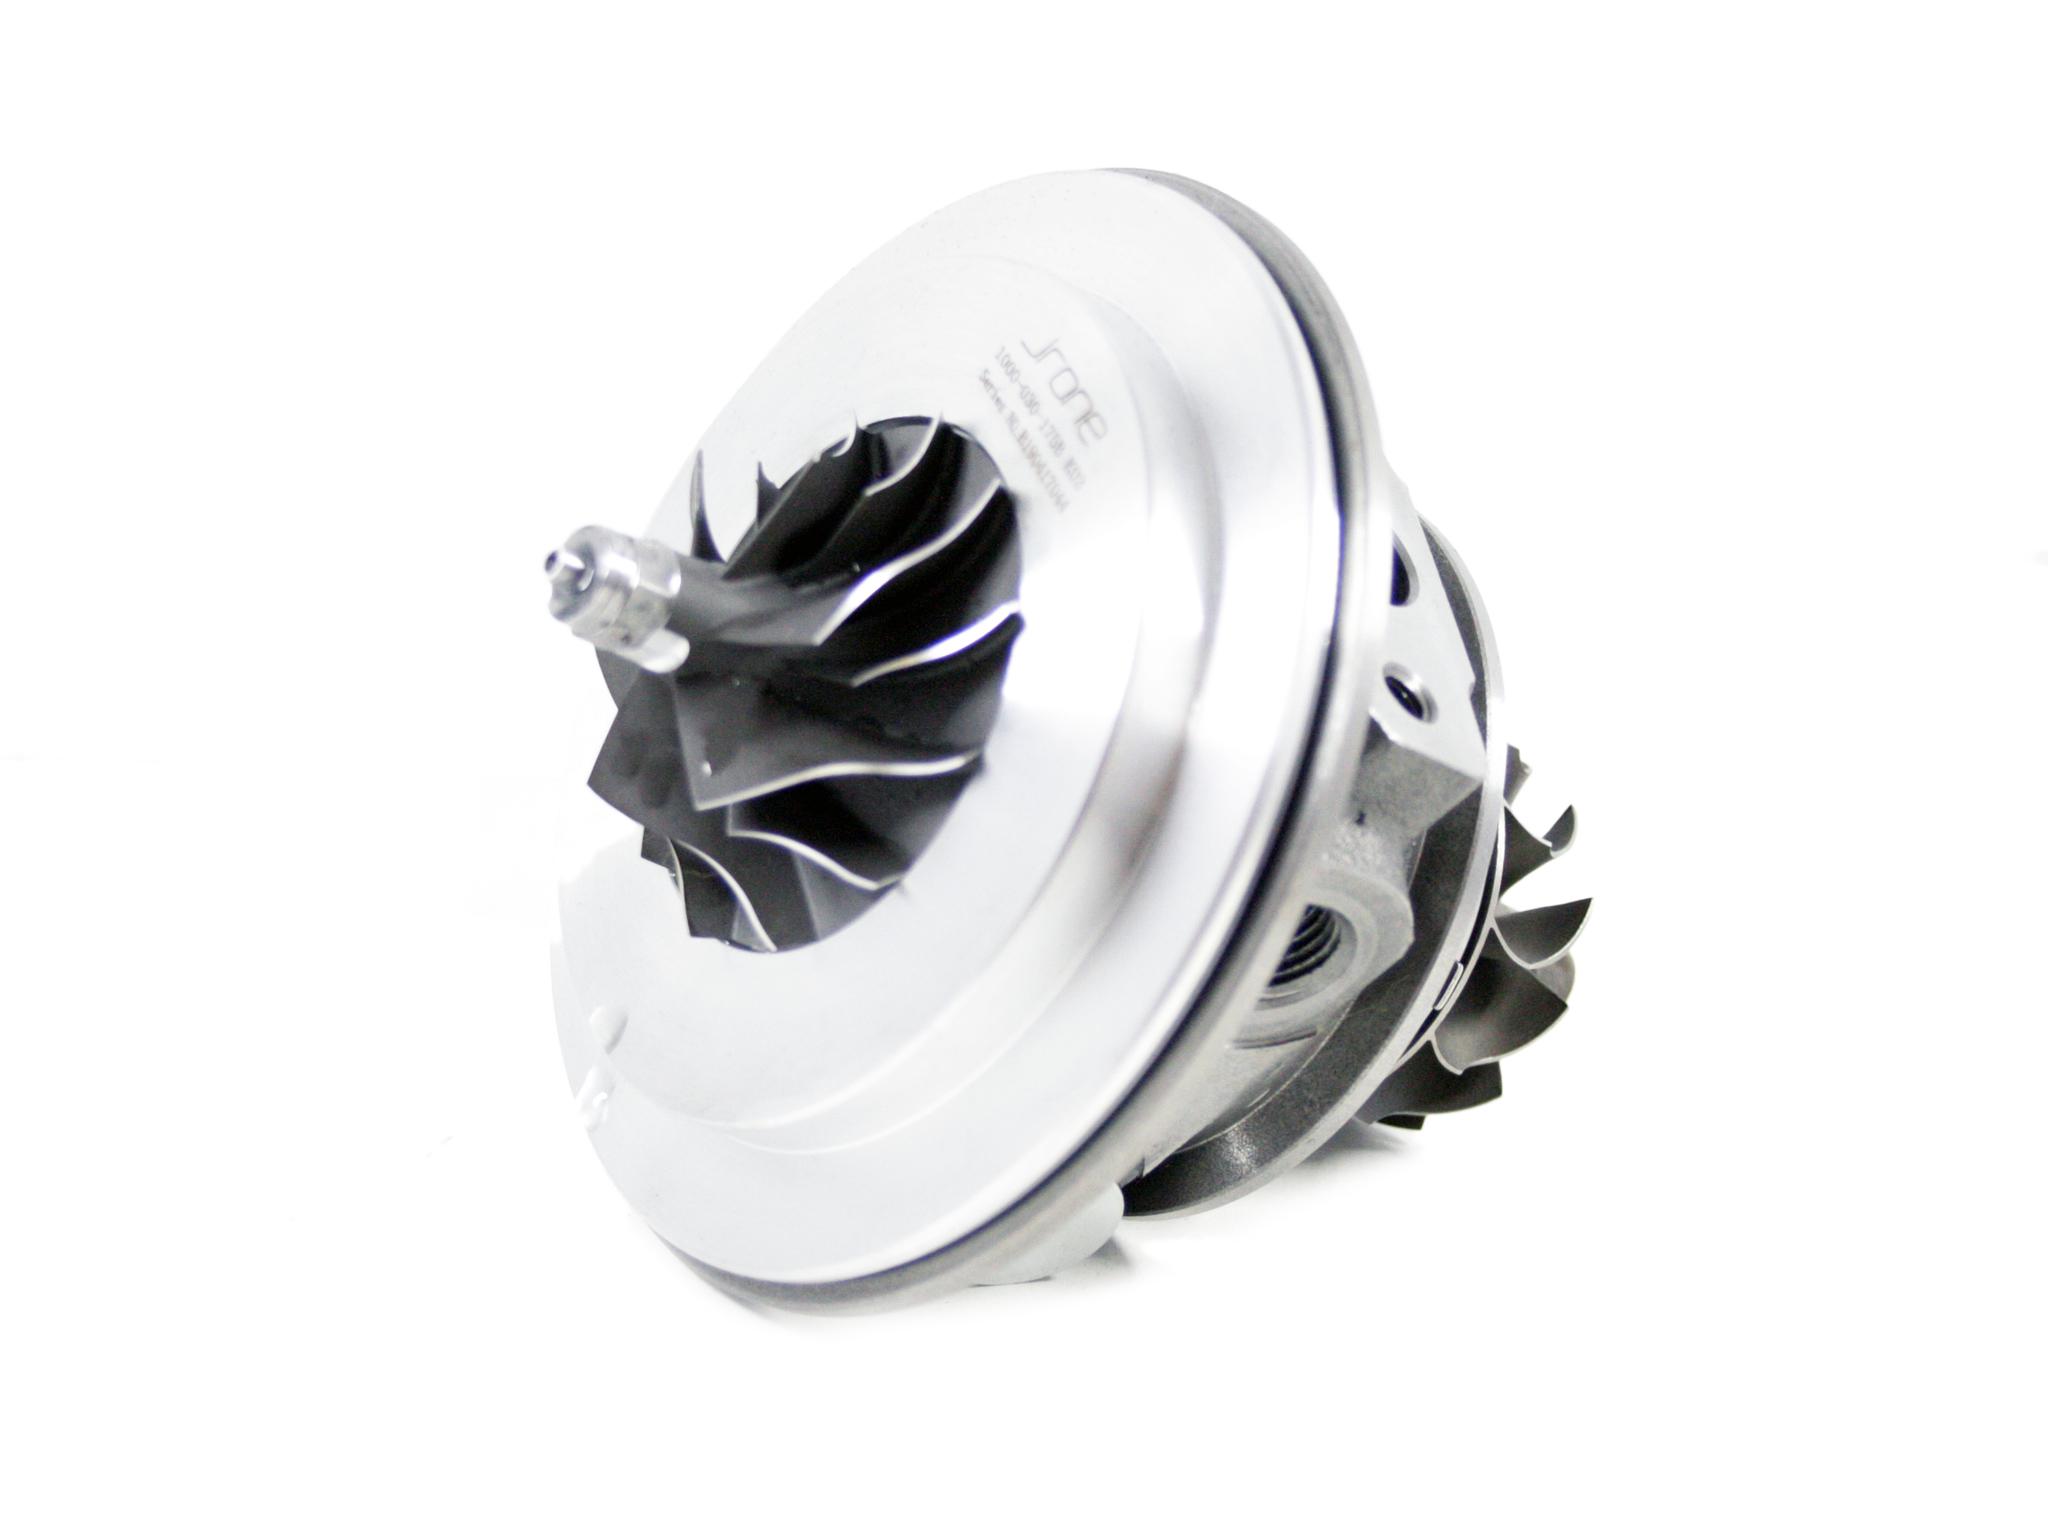 Картридж турбины К03 Сеат 1.8 TFSI 120, 160 л.с.